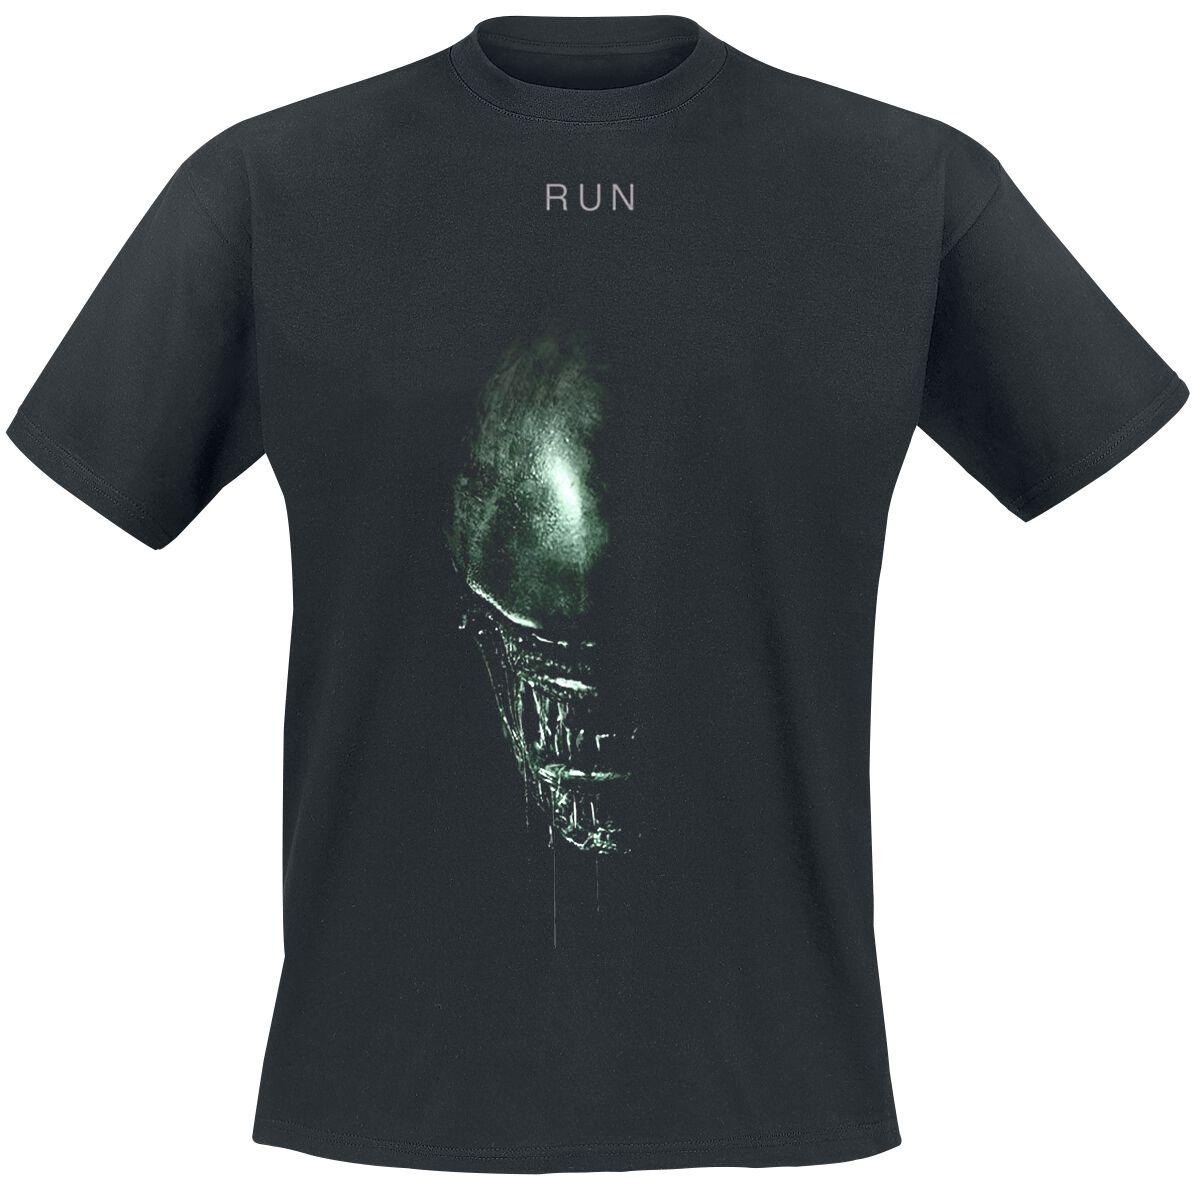 Merch dla Fanów - Koszulki - T-Shirt Alien Run T-Shirt czarny - 354550